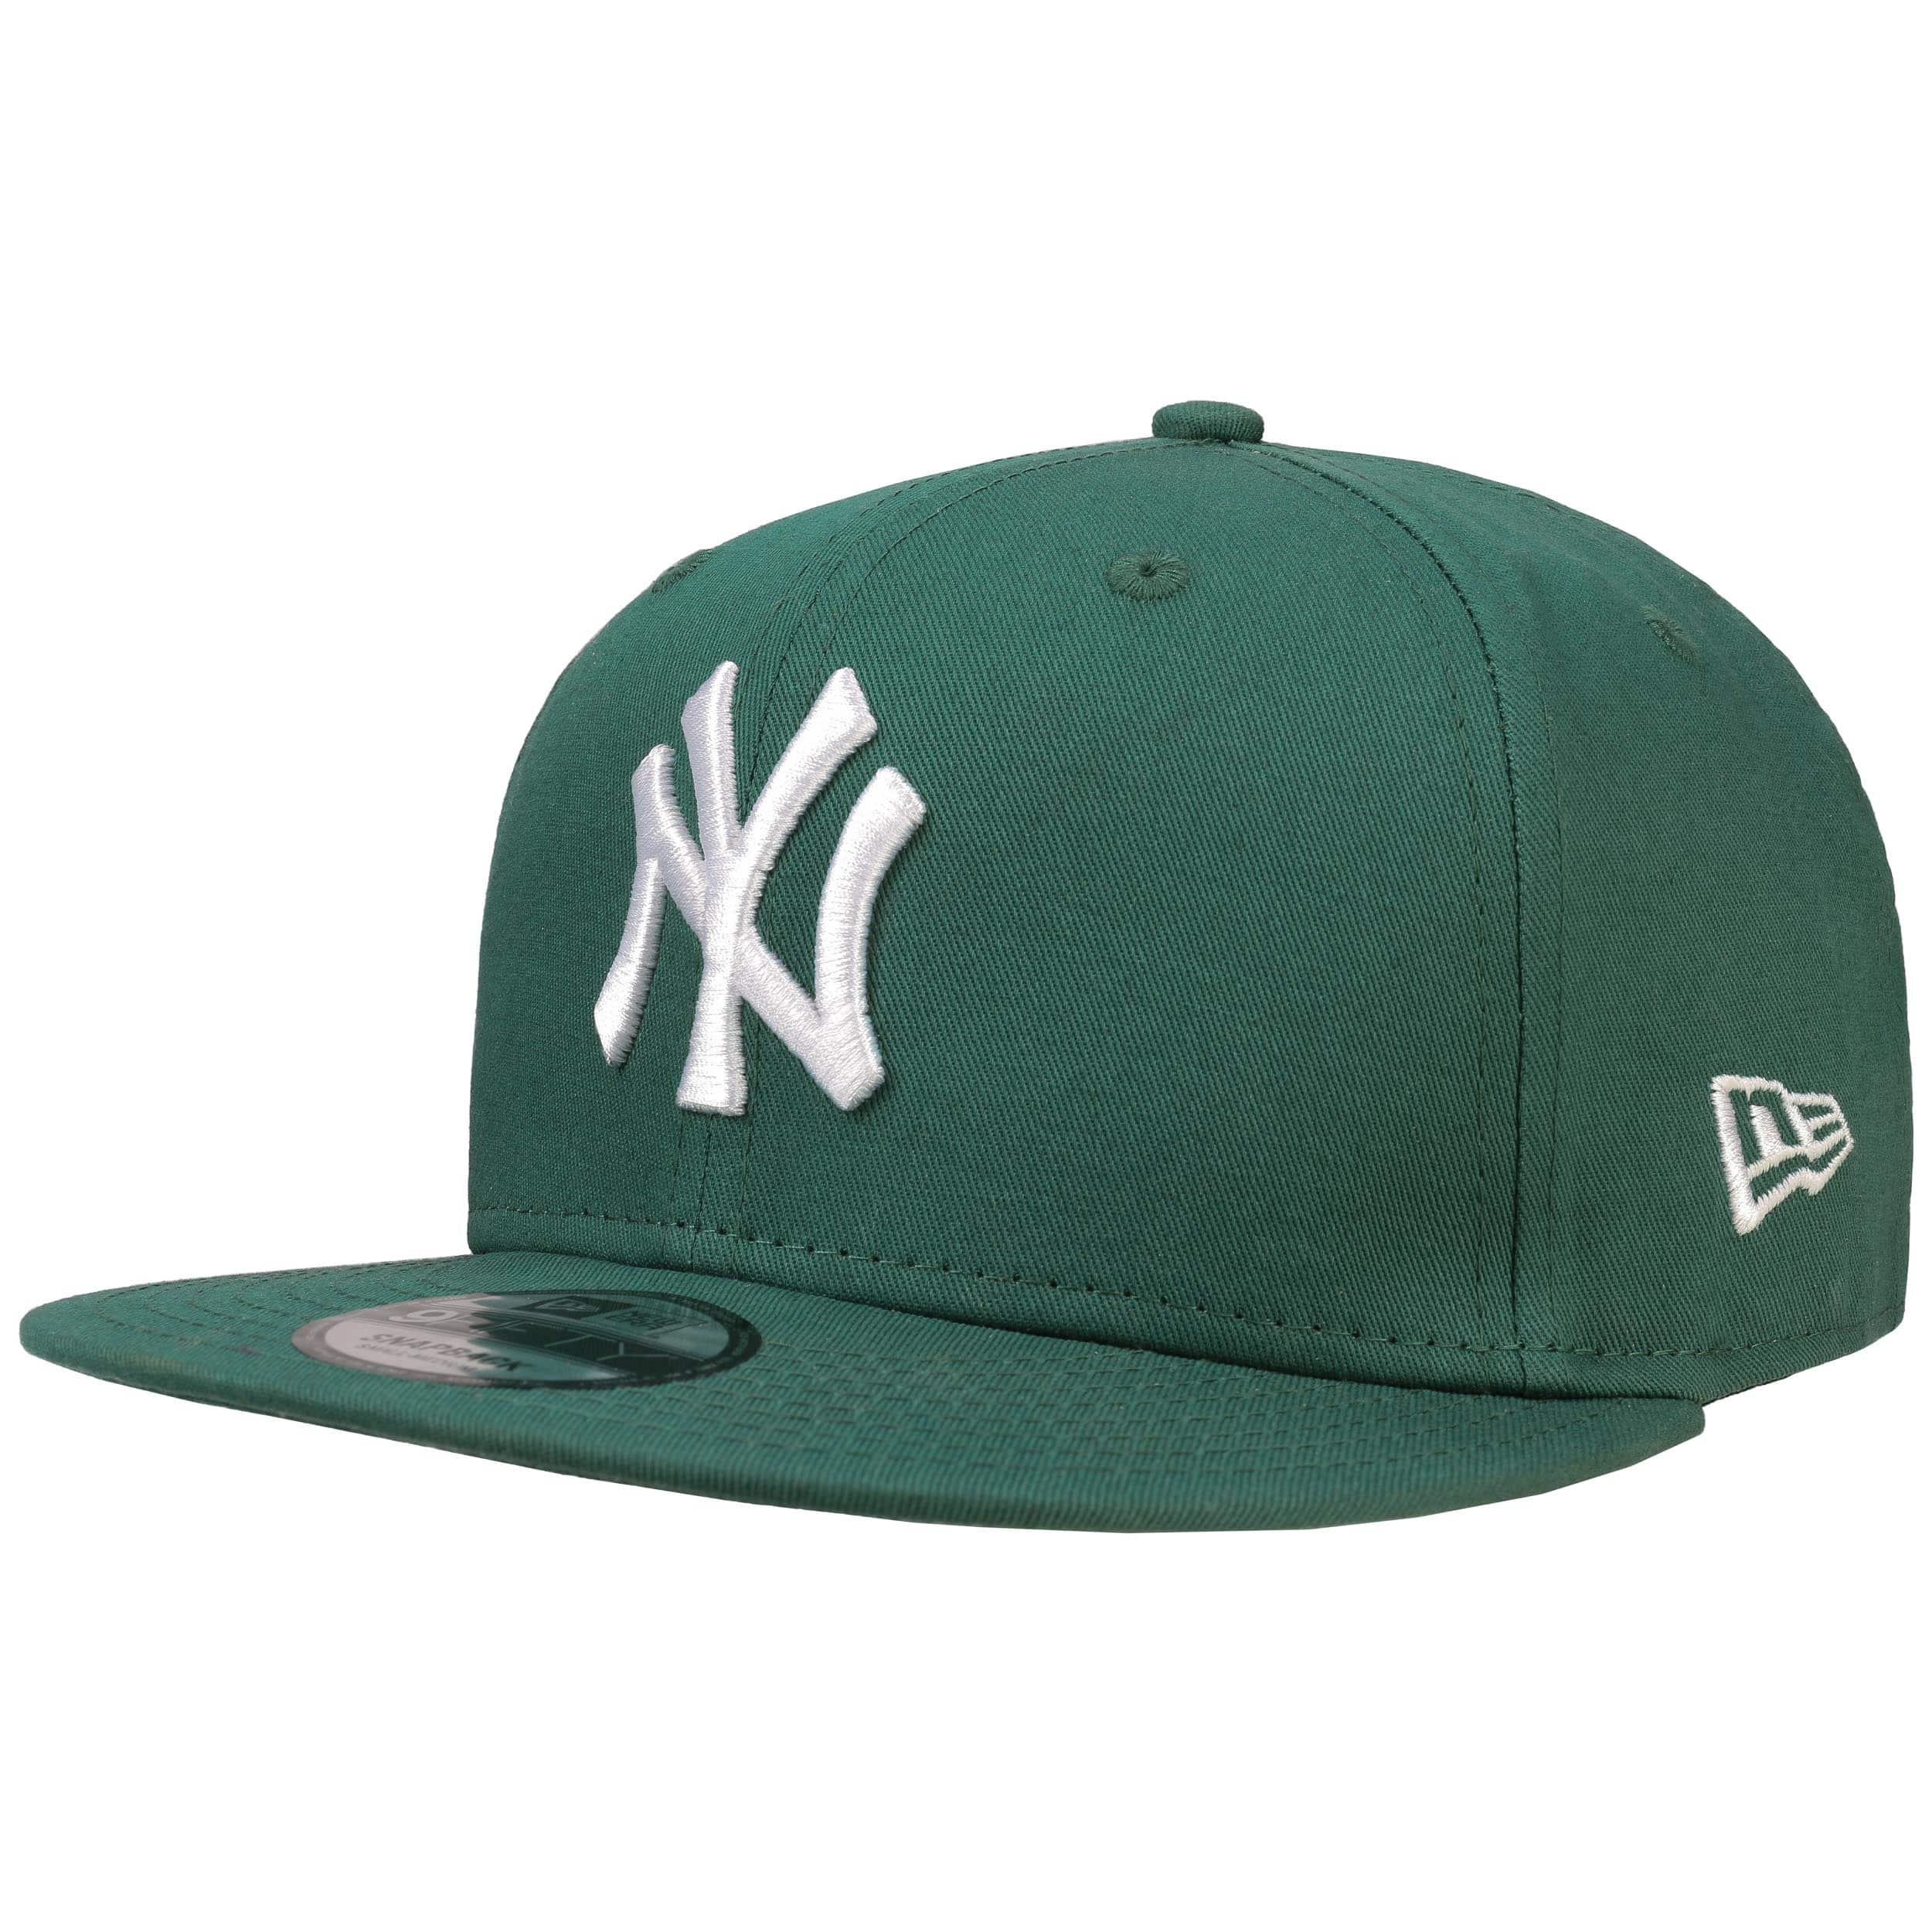 disponible nouveau design comment commander Casquette 9Fifty YOUTH Yankees by New Era